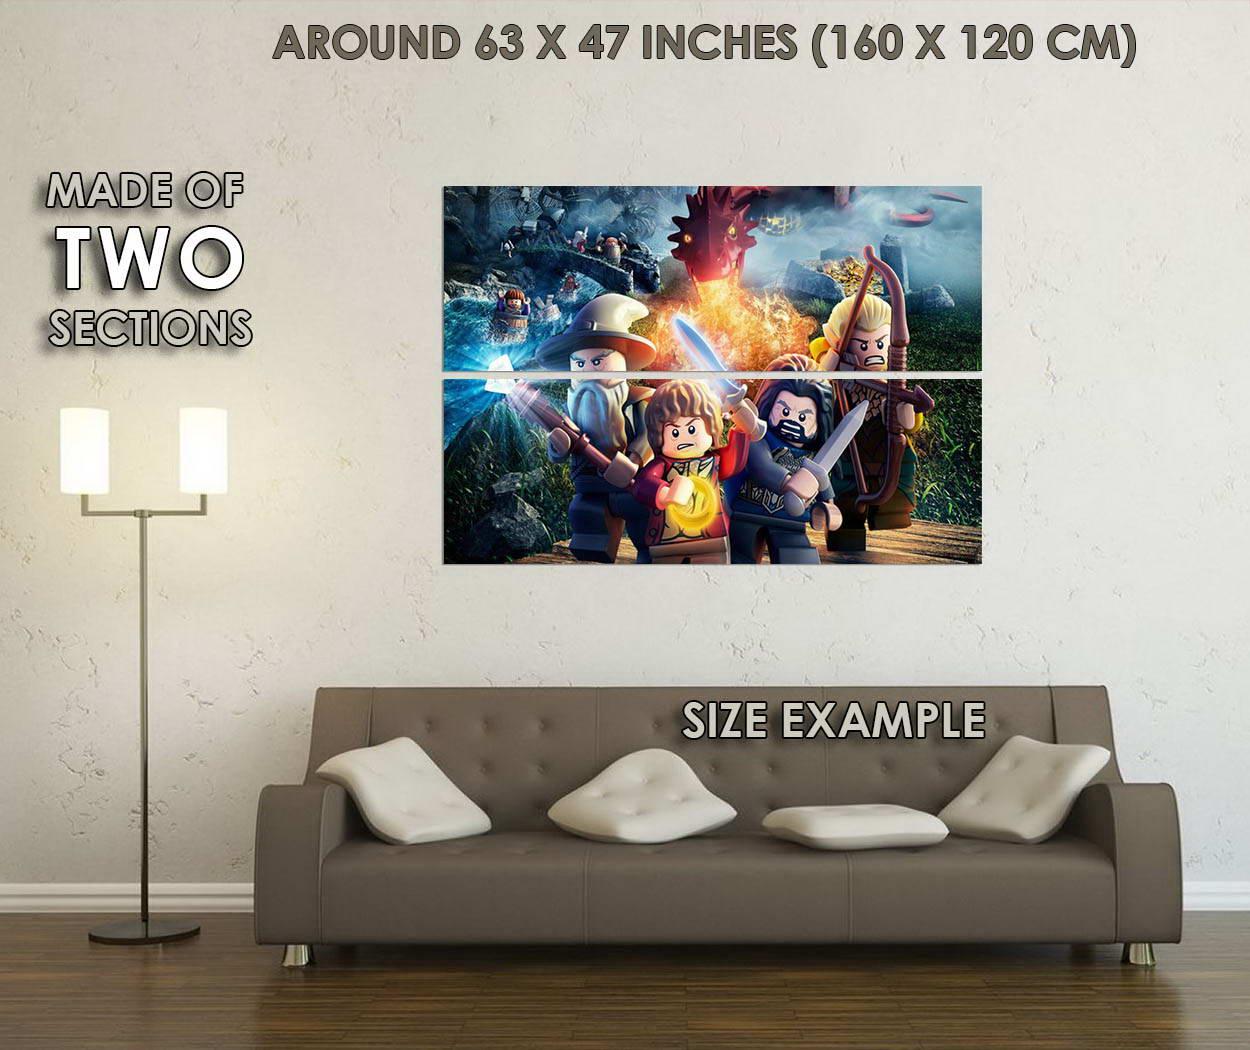 10135-LEGO-Movie-The-Hobbit-3-LAMINATED-POSTER-CA thumbnail 6